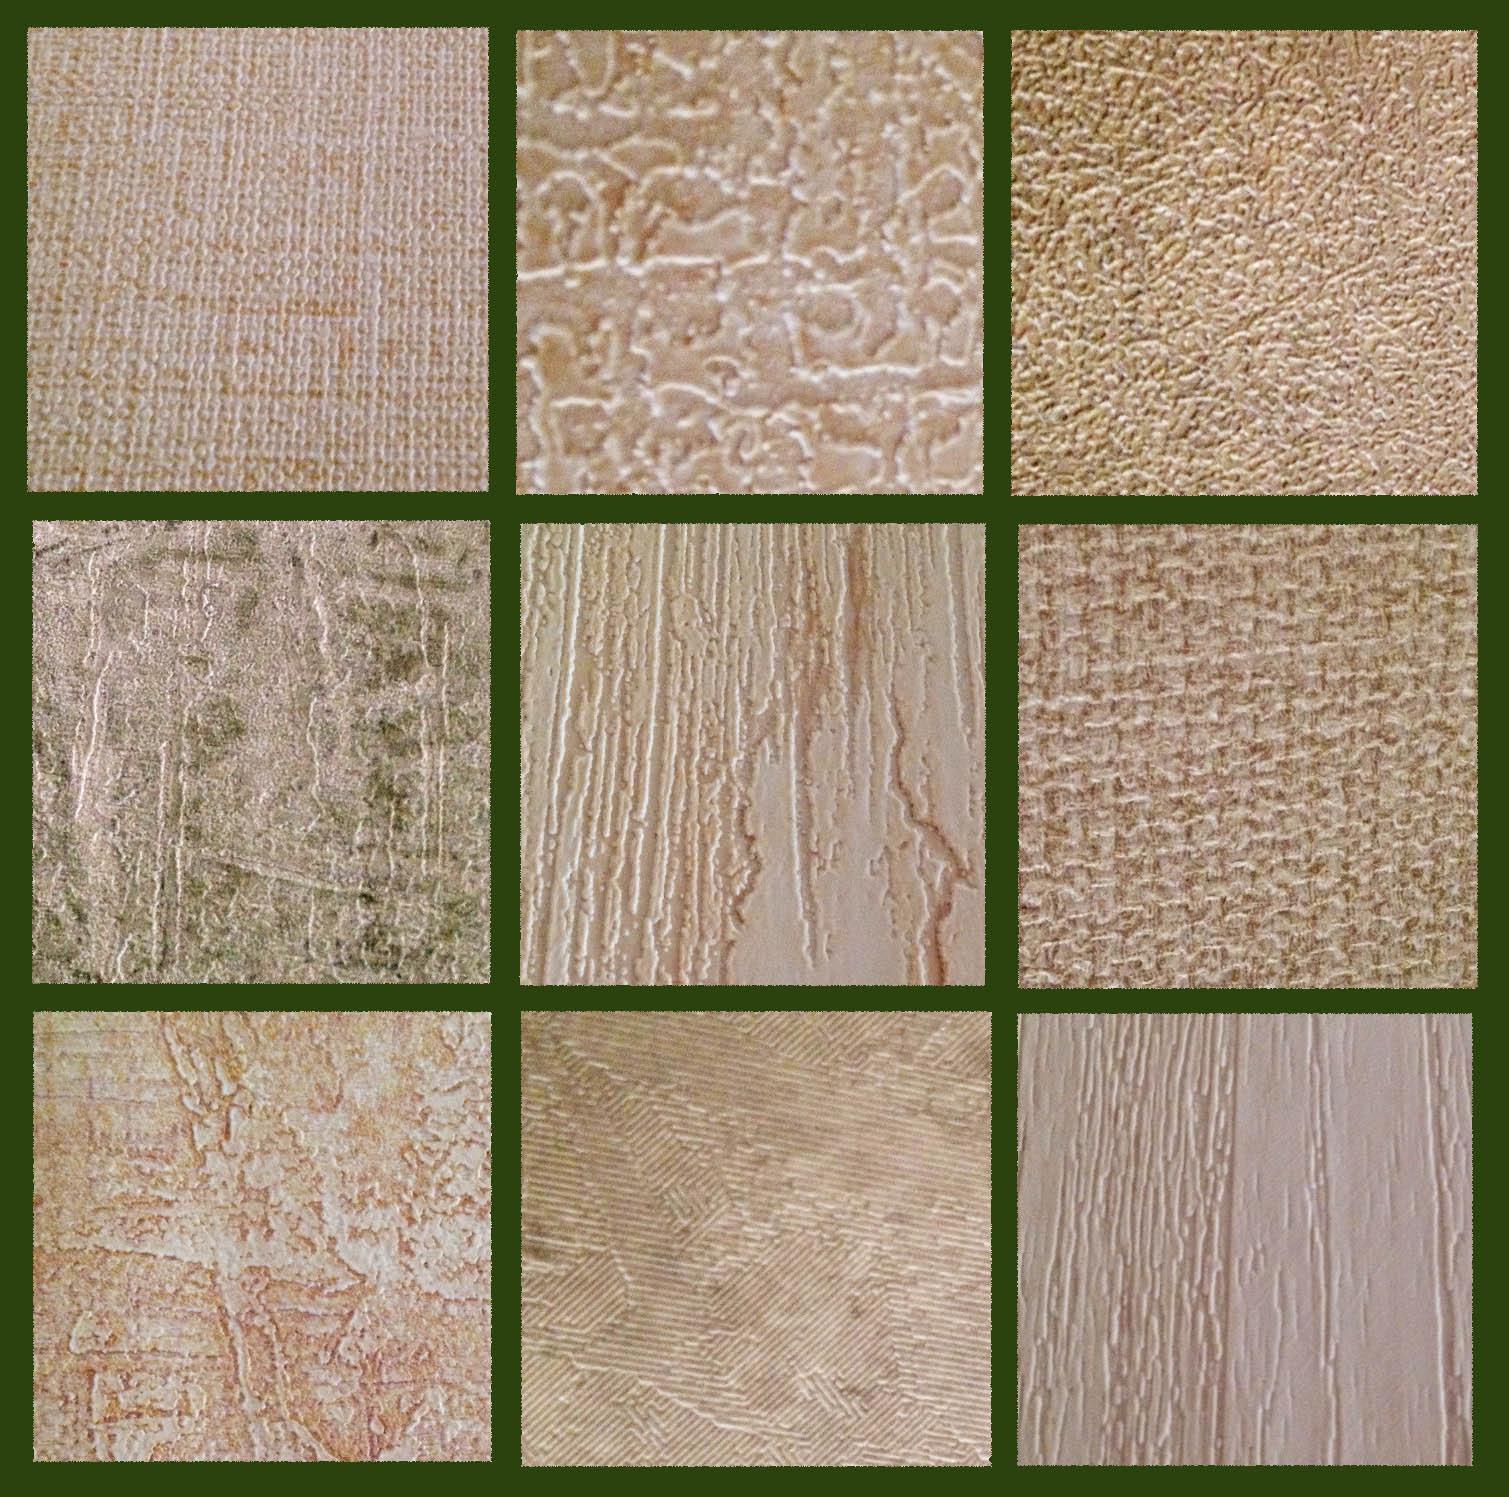 http://1.bp.blogspot.com/-VavAXnZwxuw/UPNeq4HjUmI/AAAAAAAABJs/3639pO8Cnrg/s1600/wallpaper+textures+grid+463k.jpg